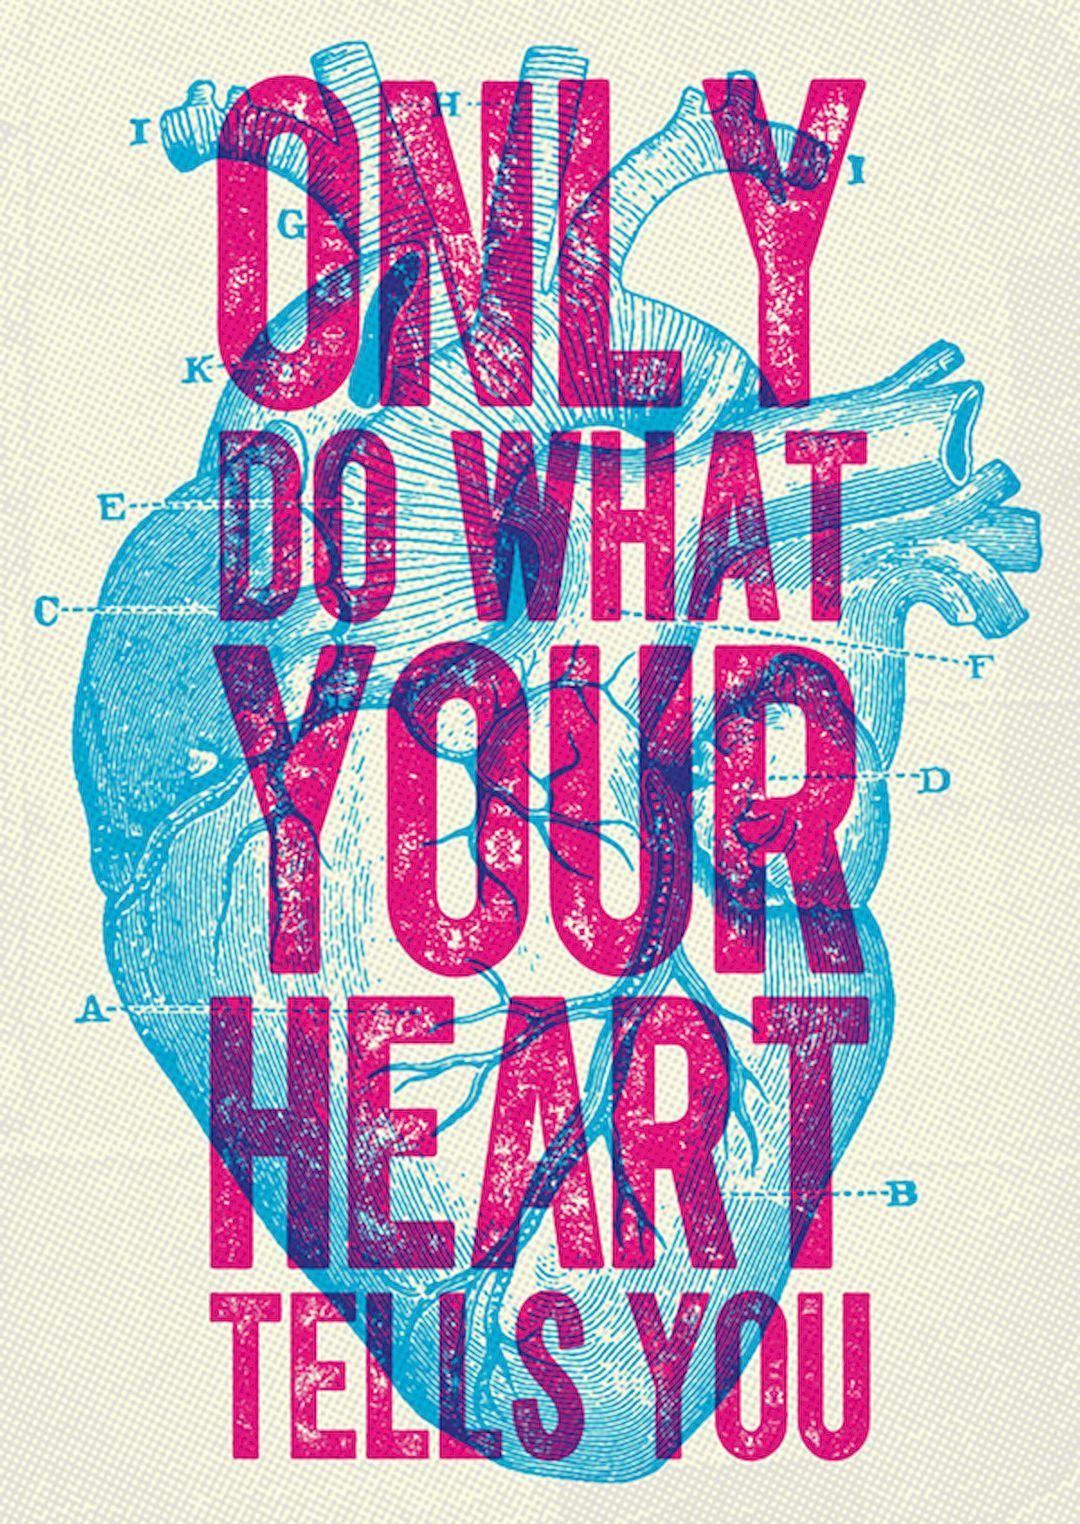 47 cool poster design ideas pinterest poster design inspiration